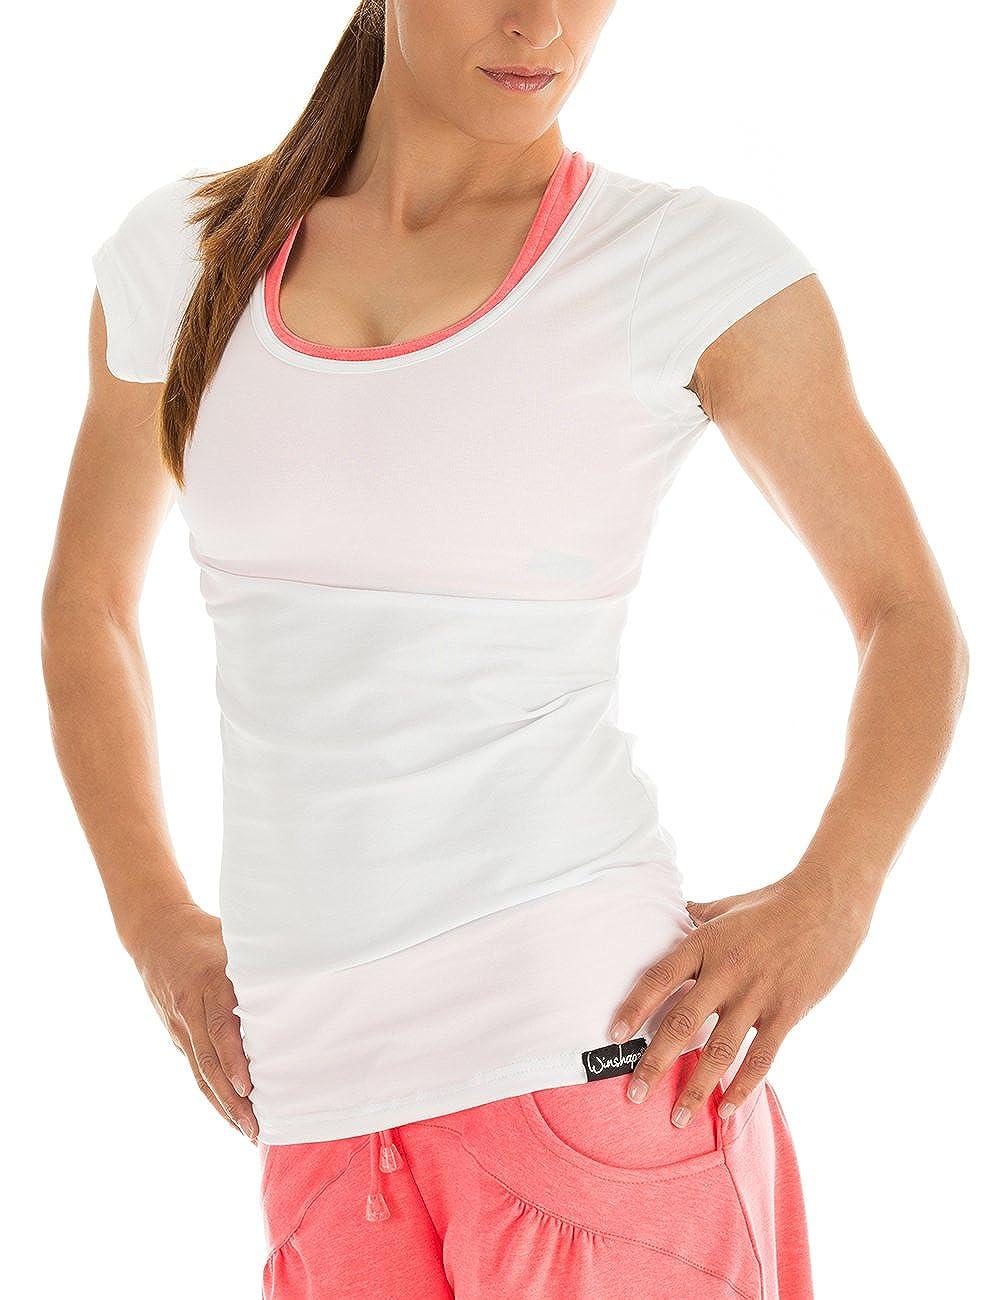 Winshape WTR4 - Camiseta de Yoga o Entrenamiento para Mujer (diseño de Manga Corta)